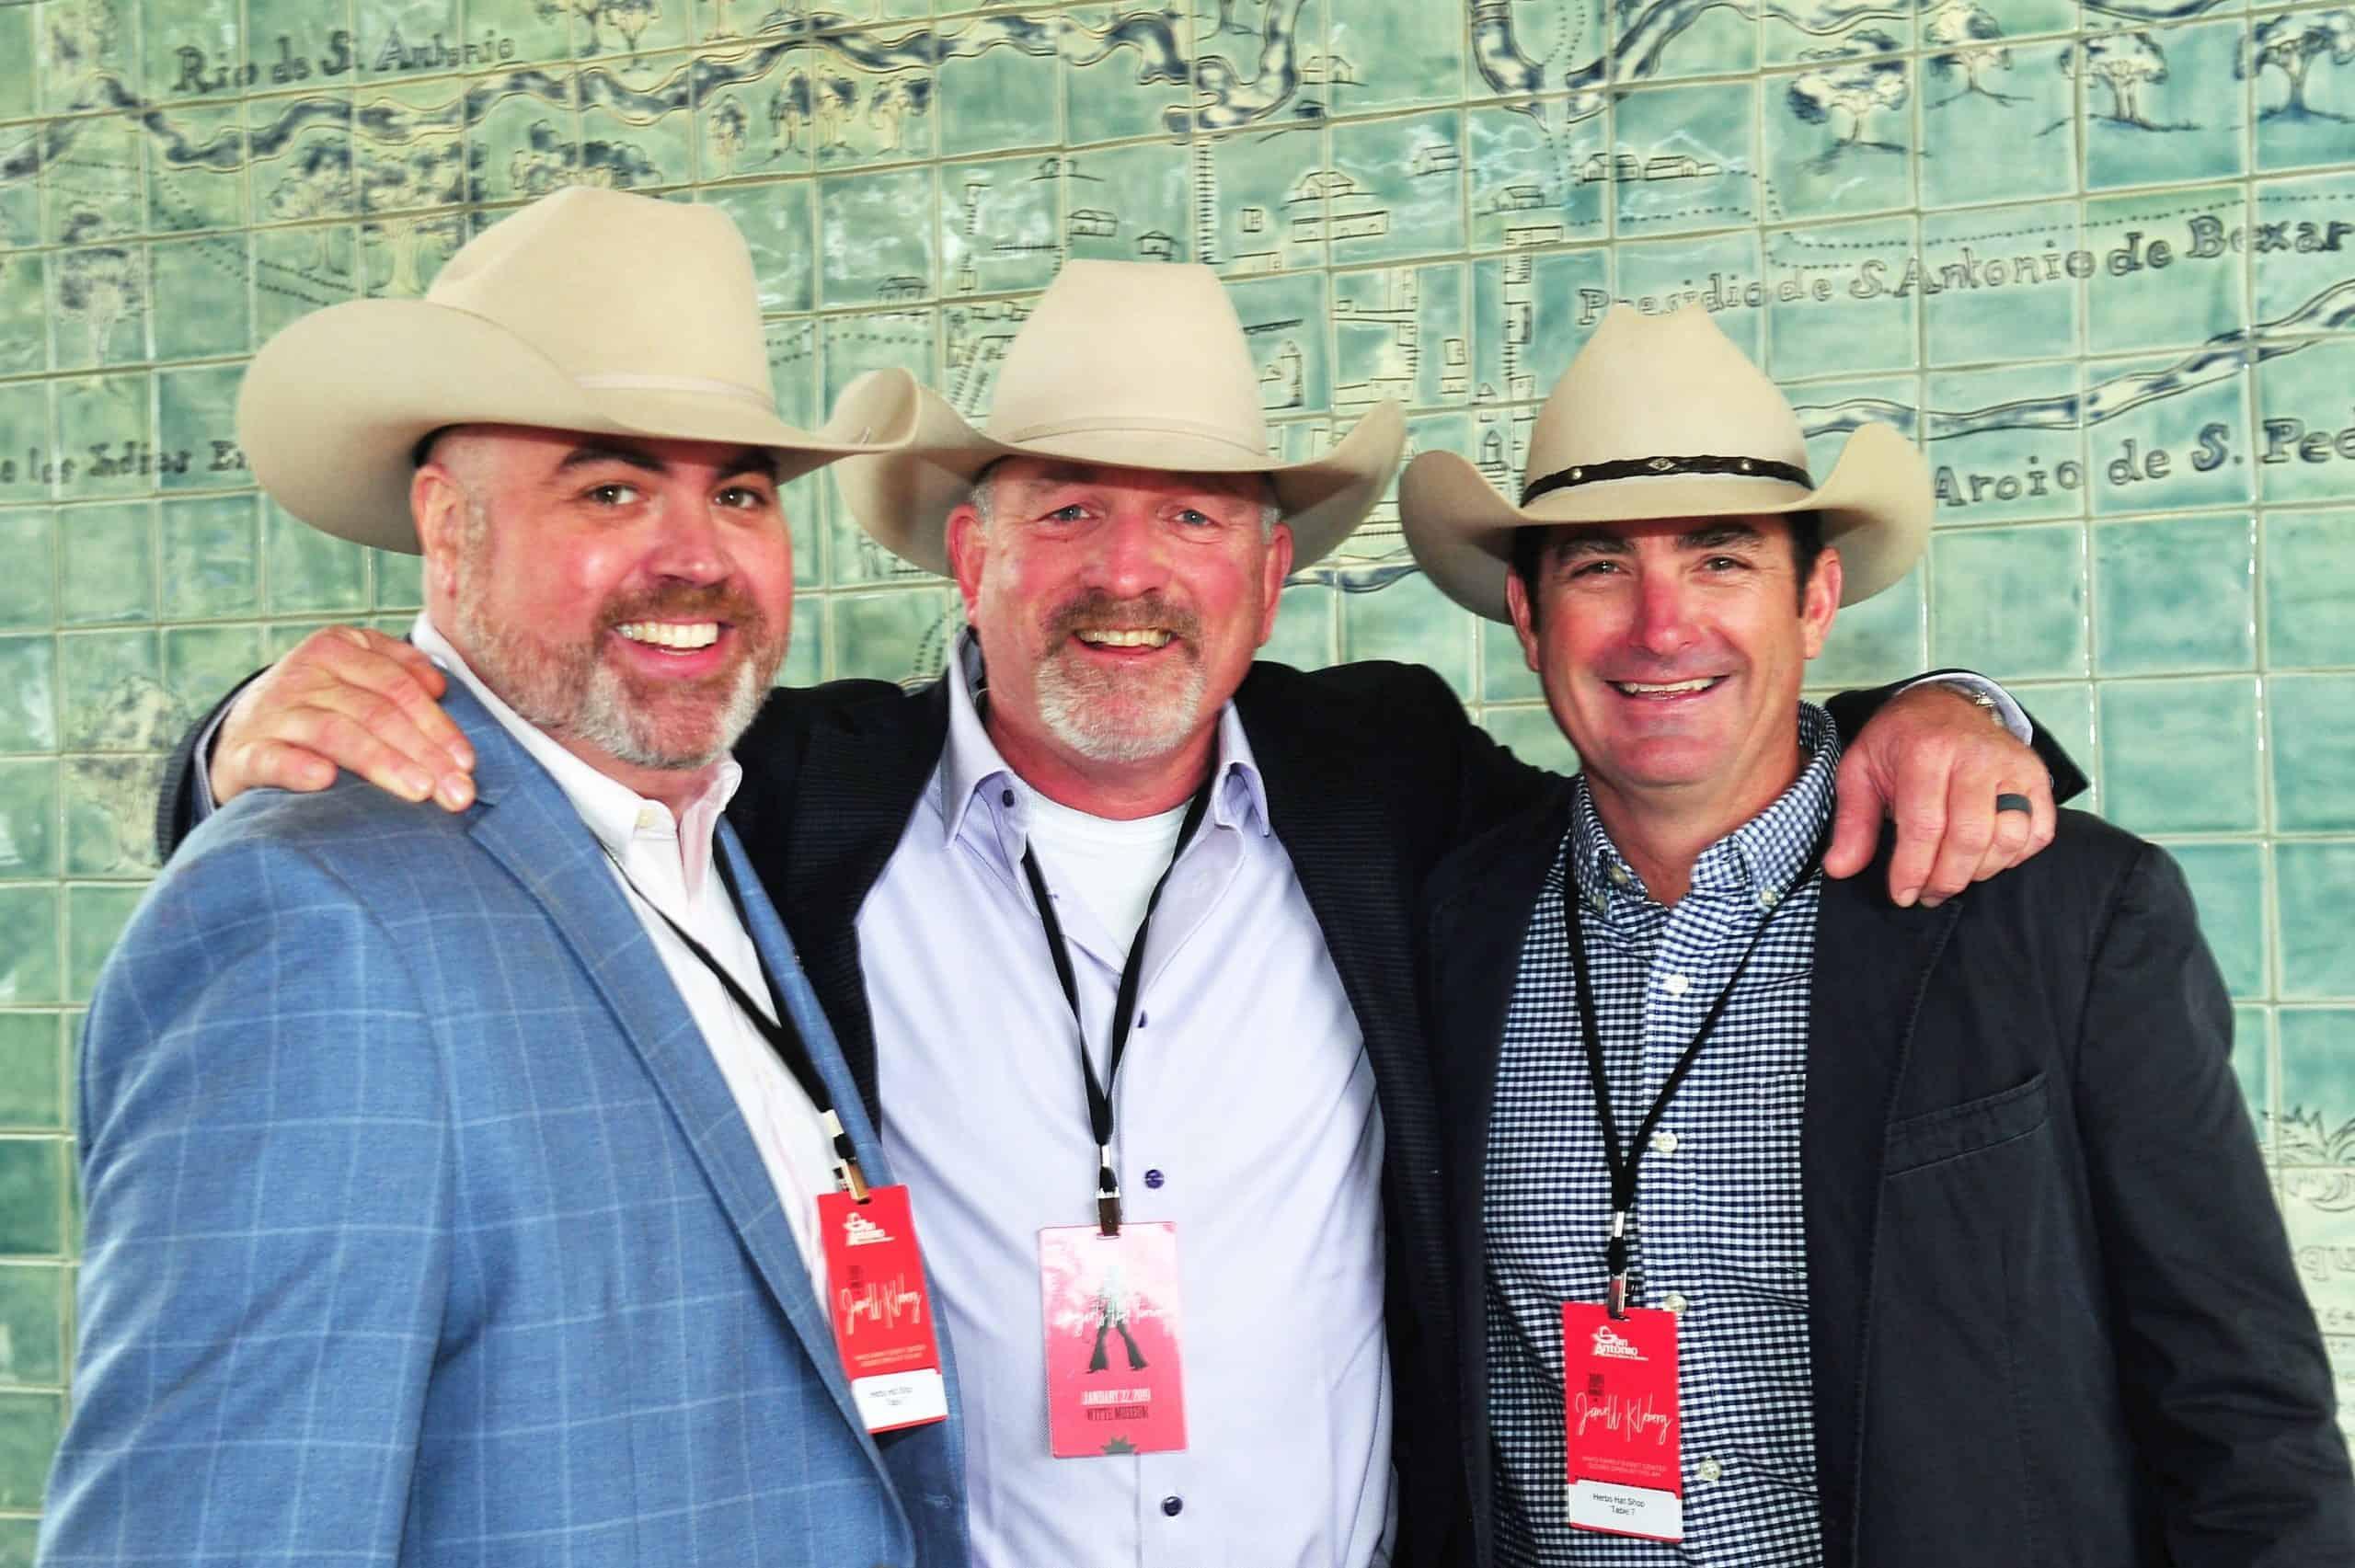 Scott Lamoureux, Brian Maynard and Matt Maroney